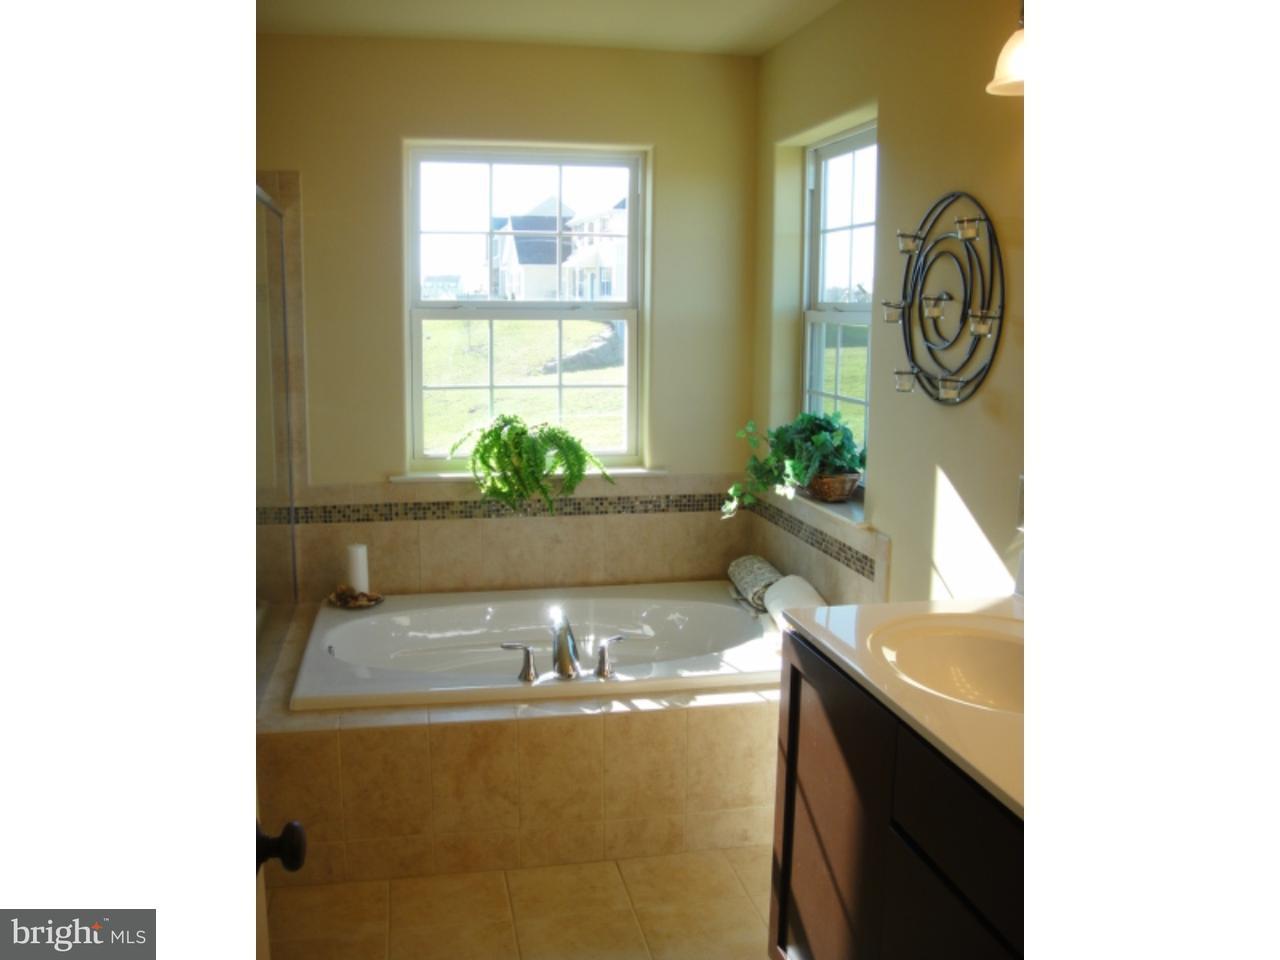 Additional photo for property listing at Lot 4 WEINSTEIGER Road  Bechtelsville, Pennsylvania 19505 Estados Unidos